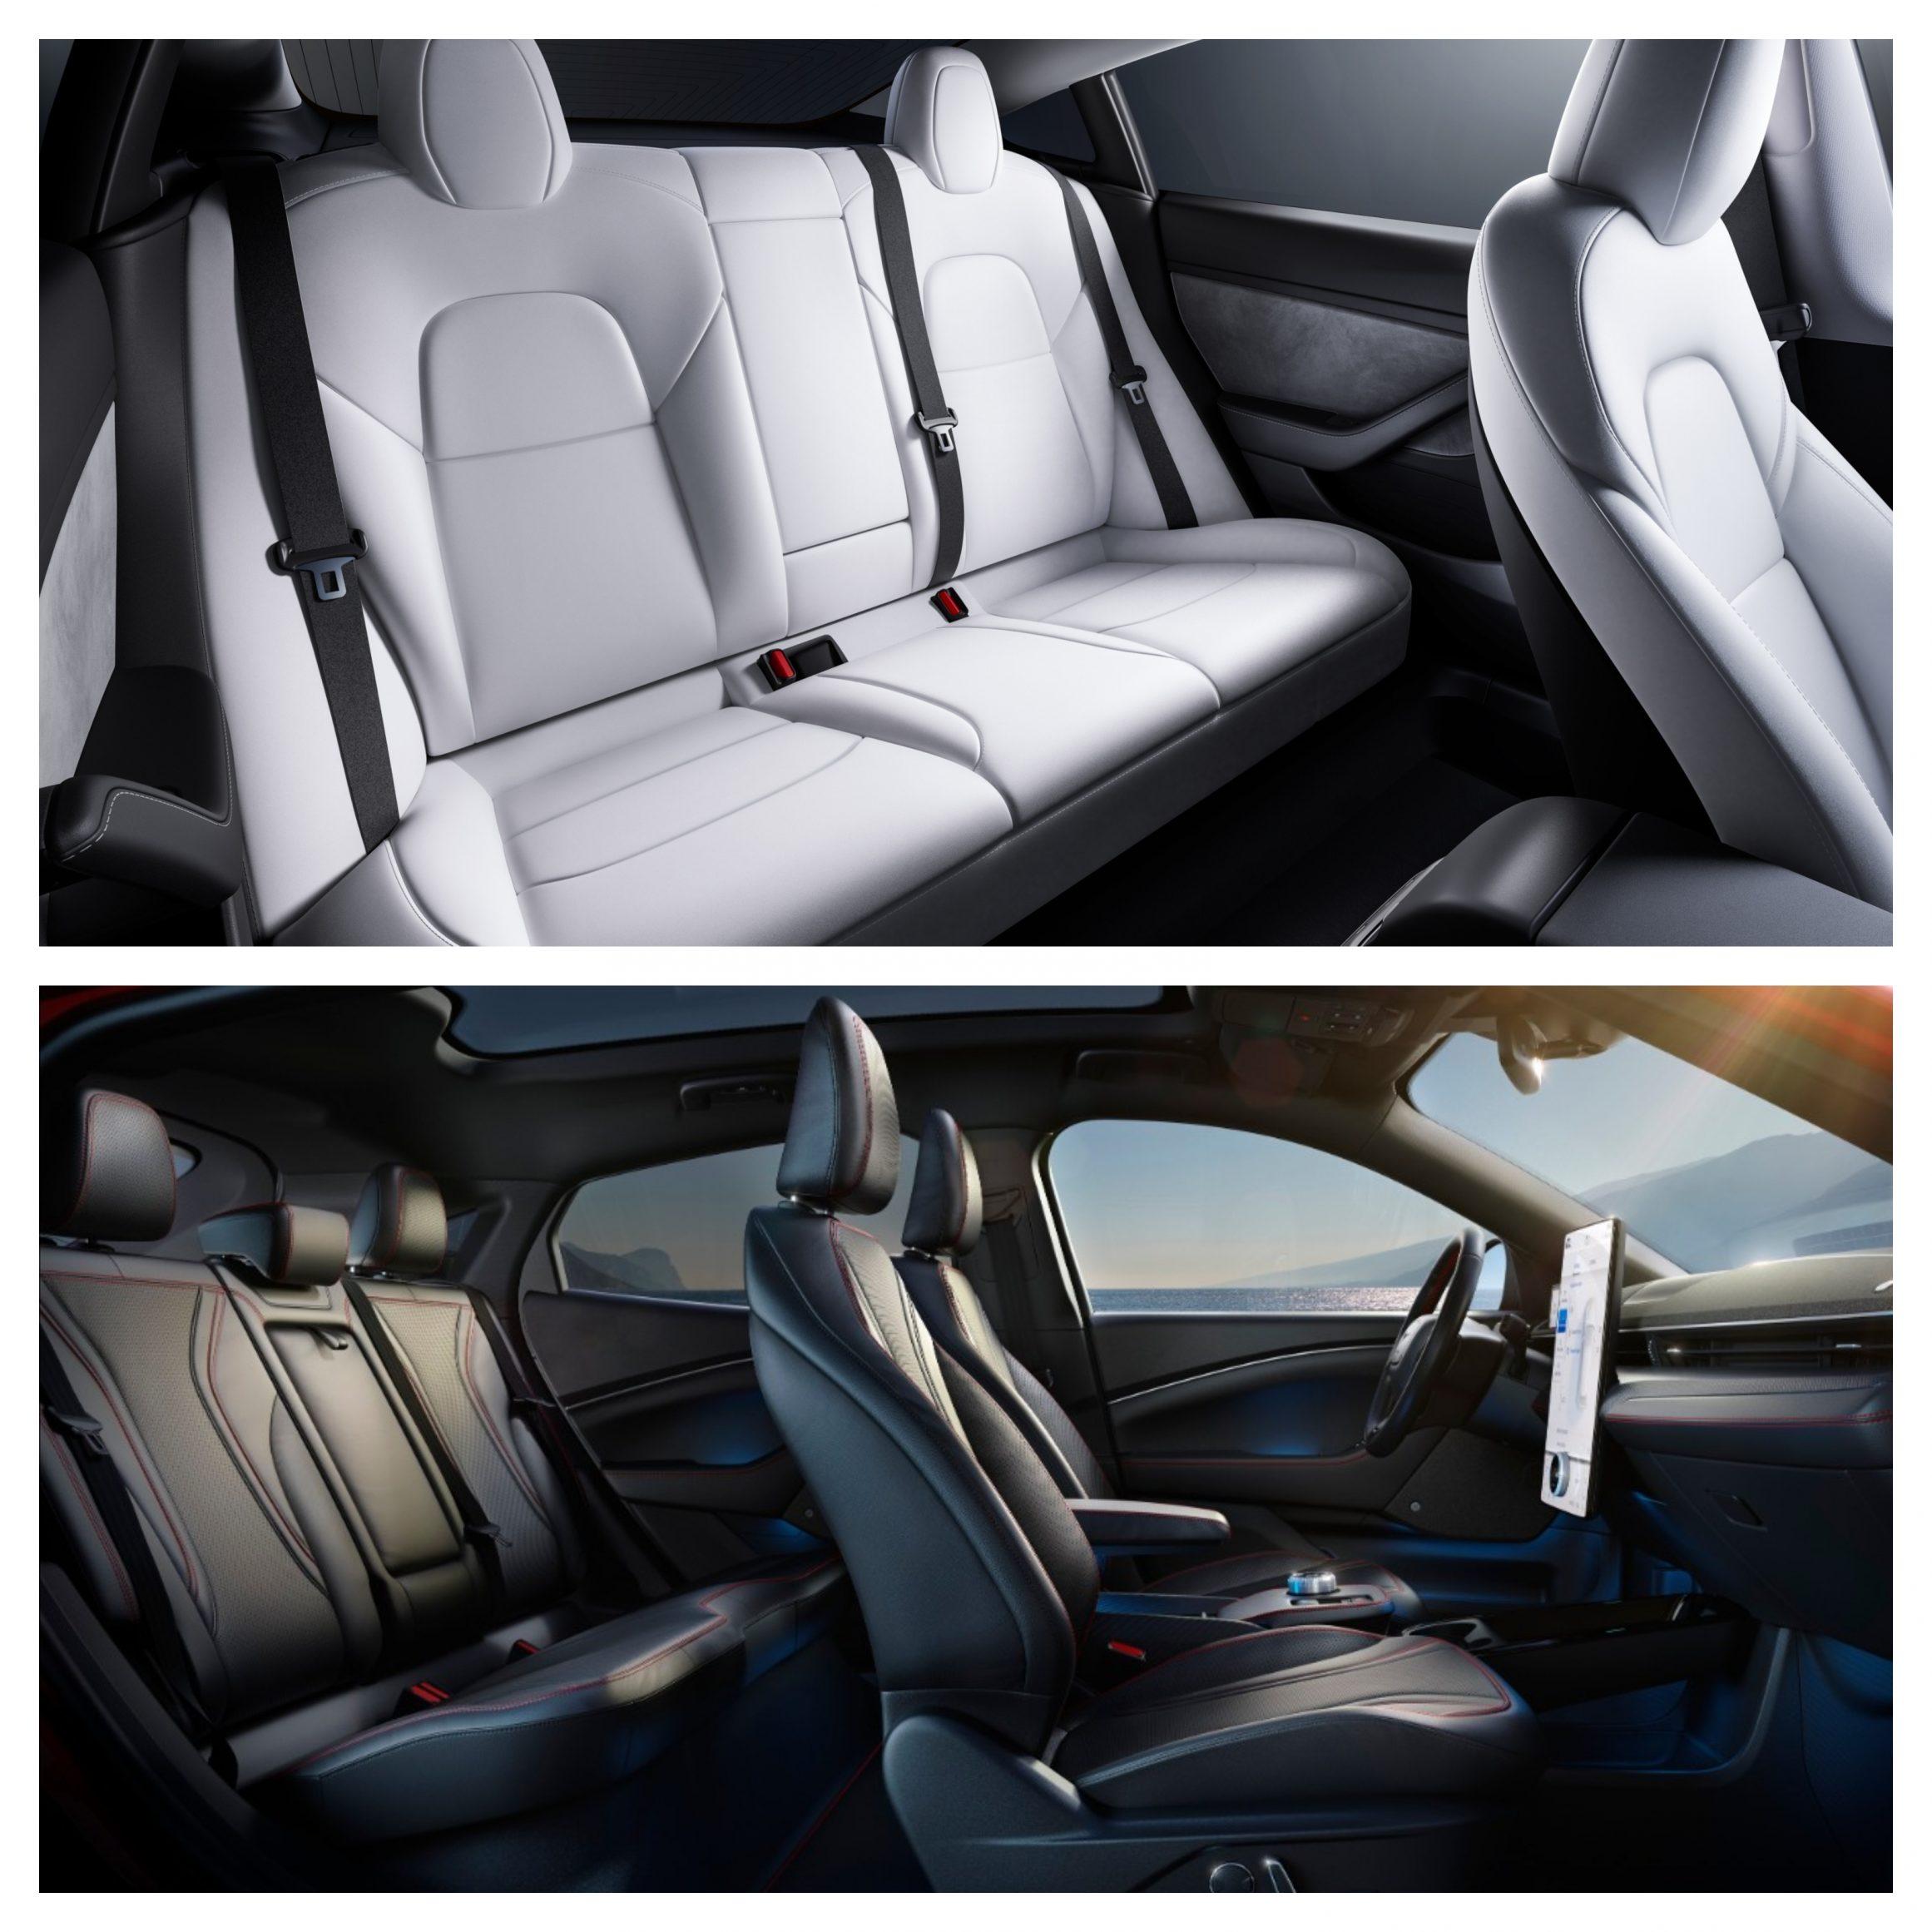 Tesla Model 3 Vs Ford Mustang Mach-E - interior space